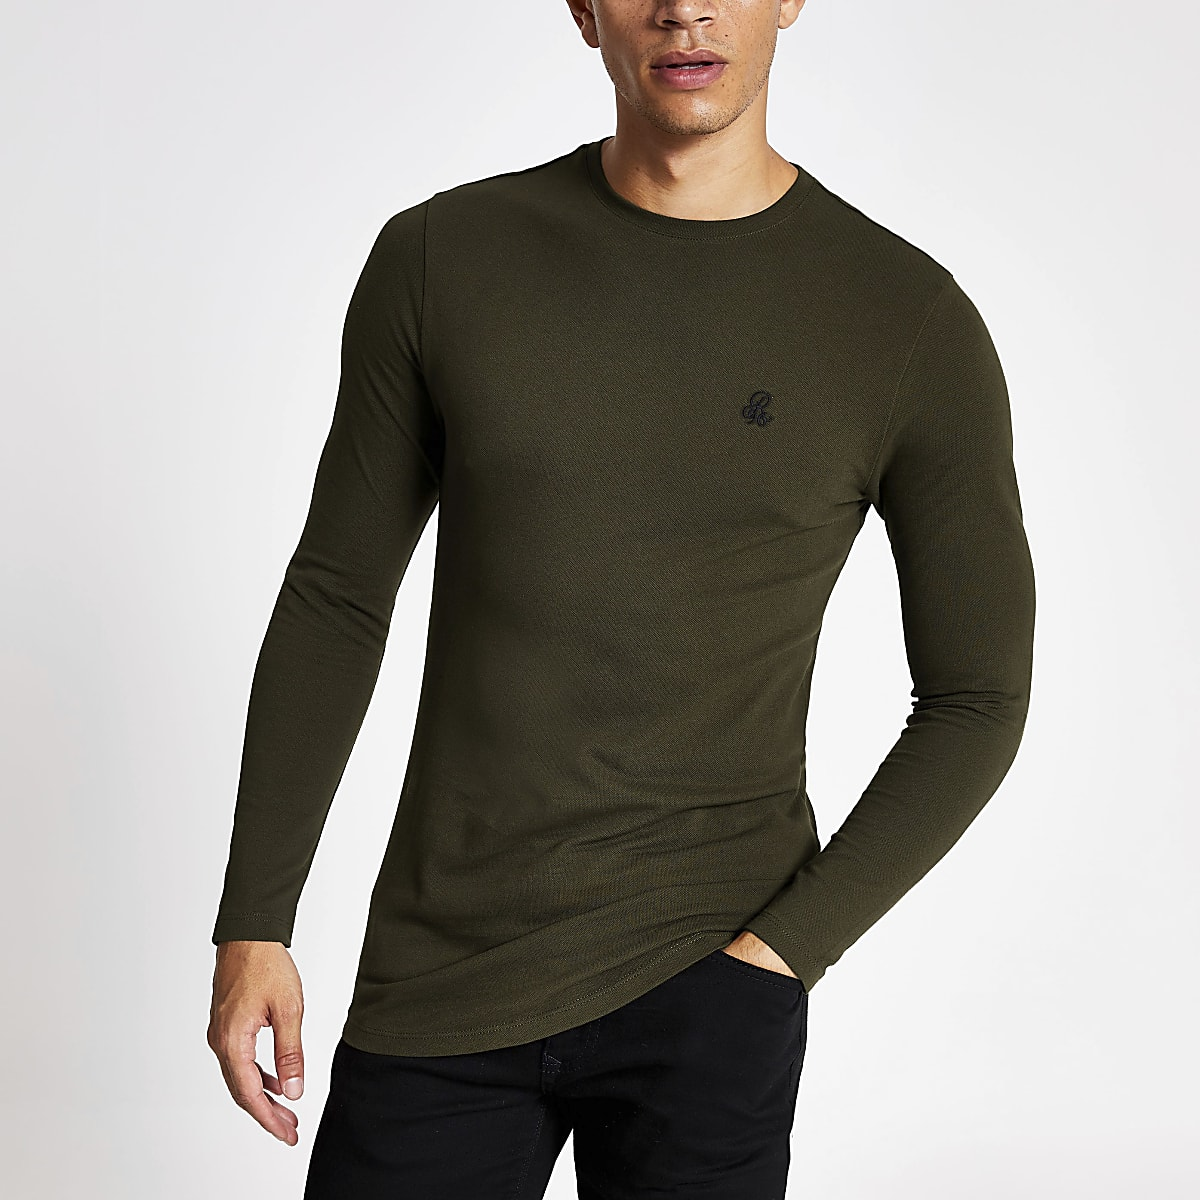 Donkergroen R96 T-shirt met lange mouwen